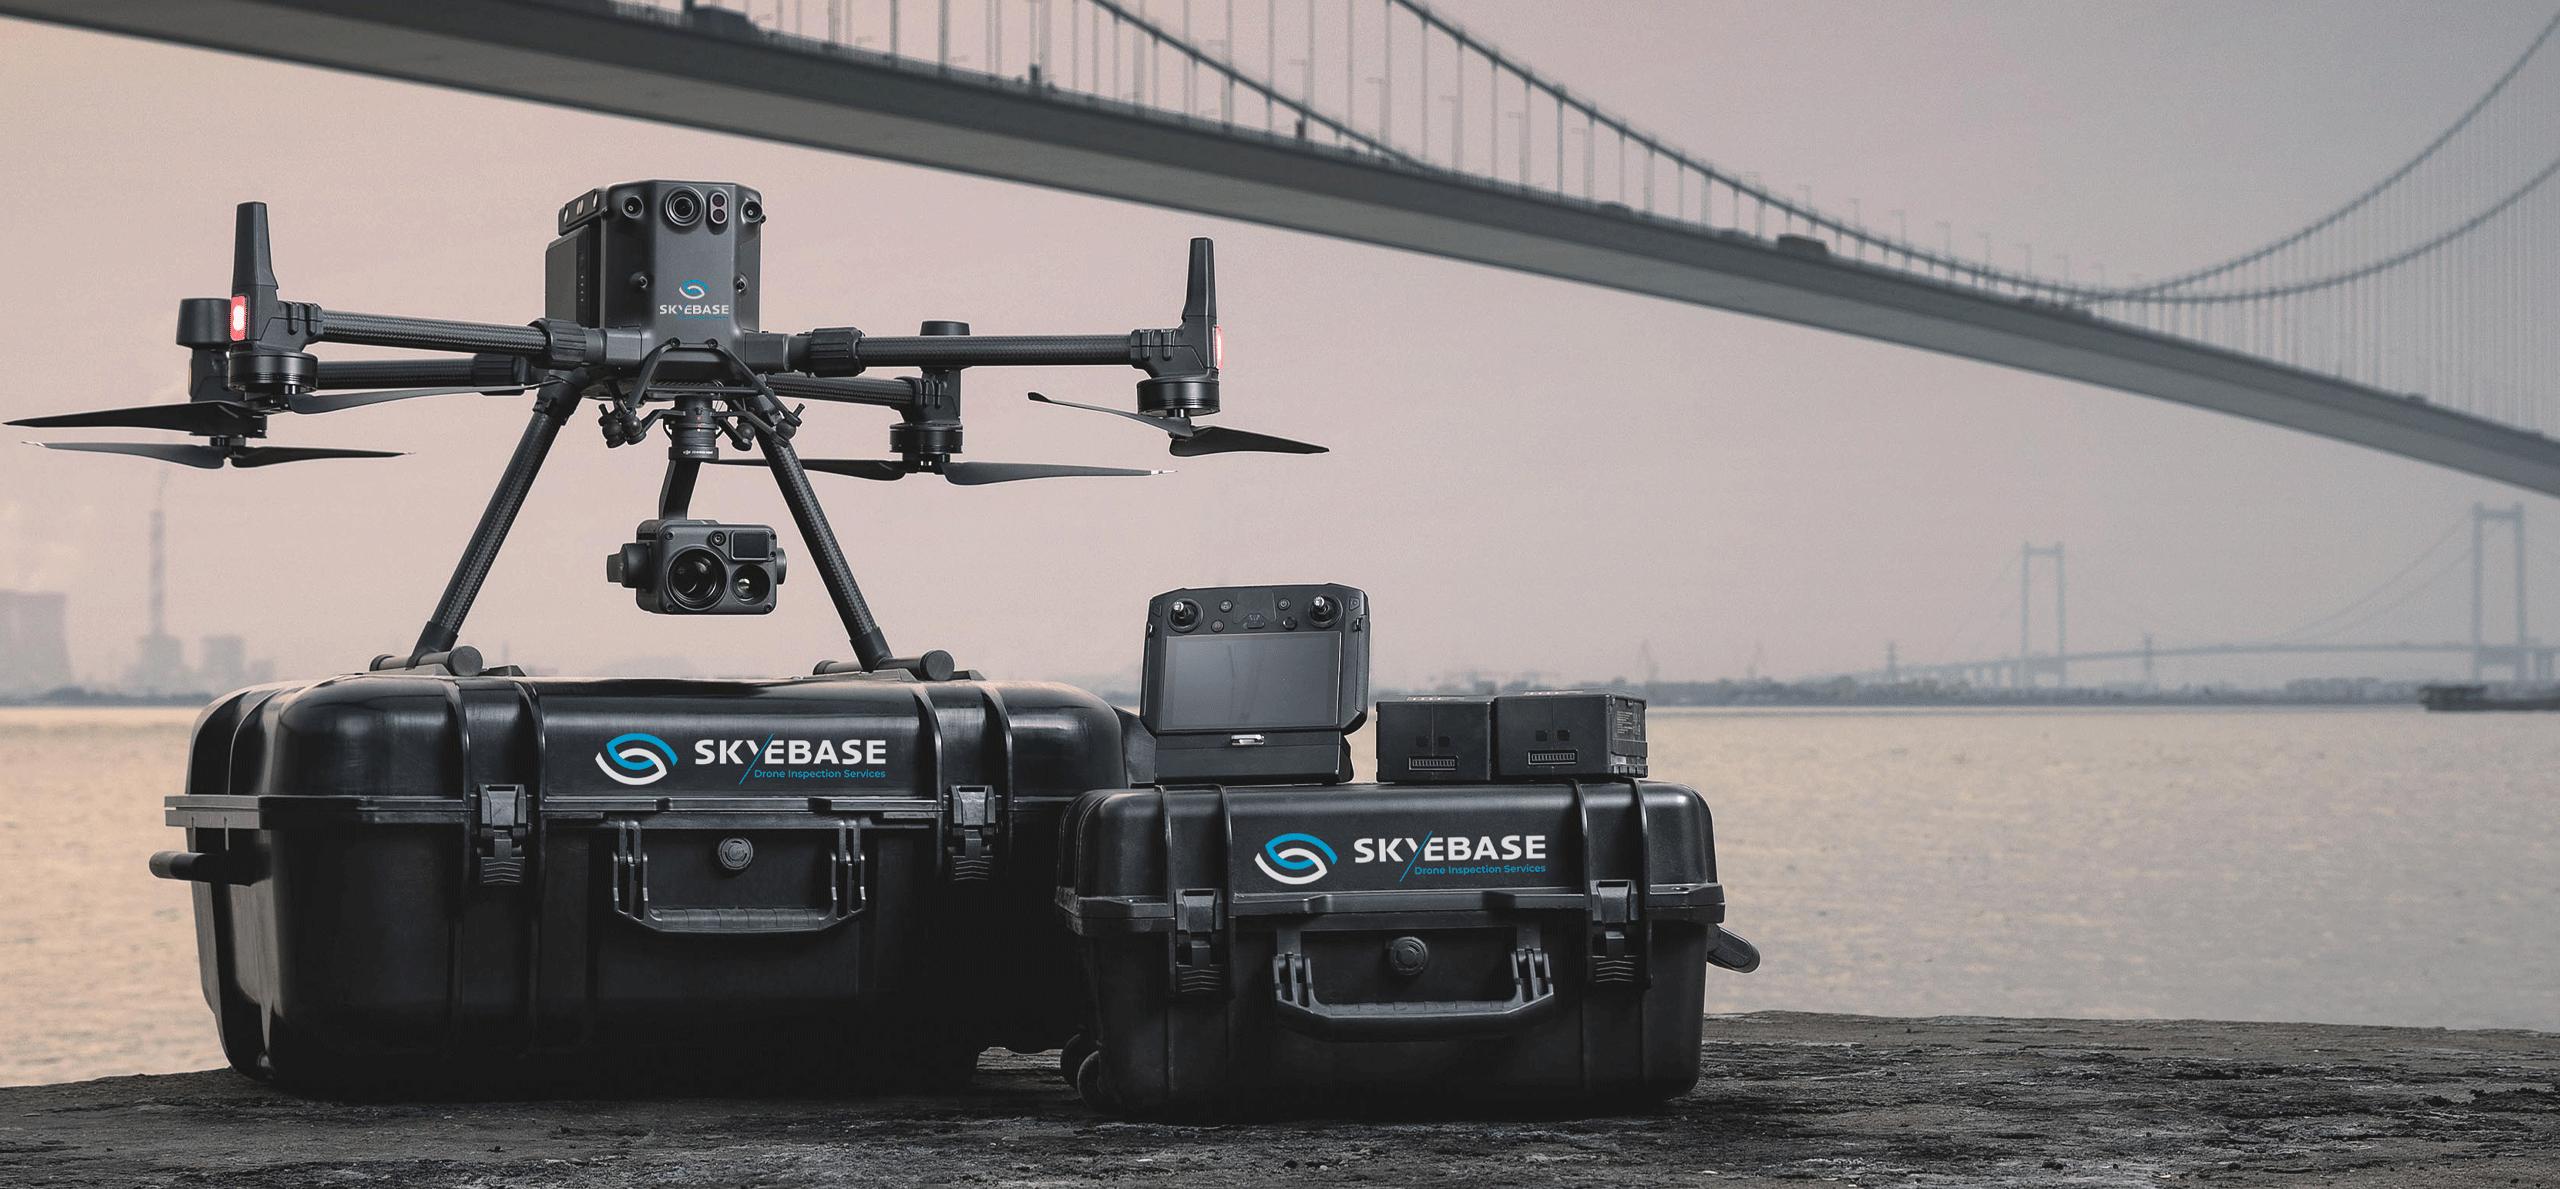 Skyebase drone